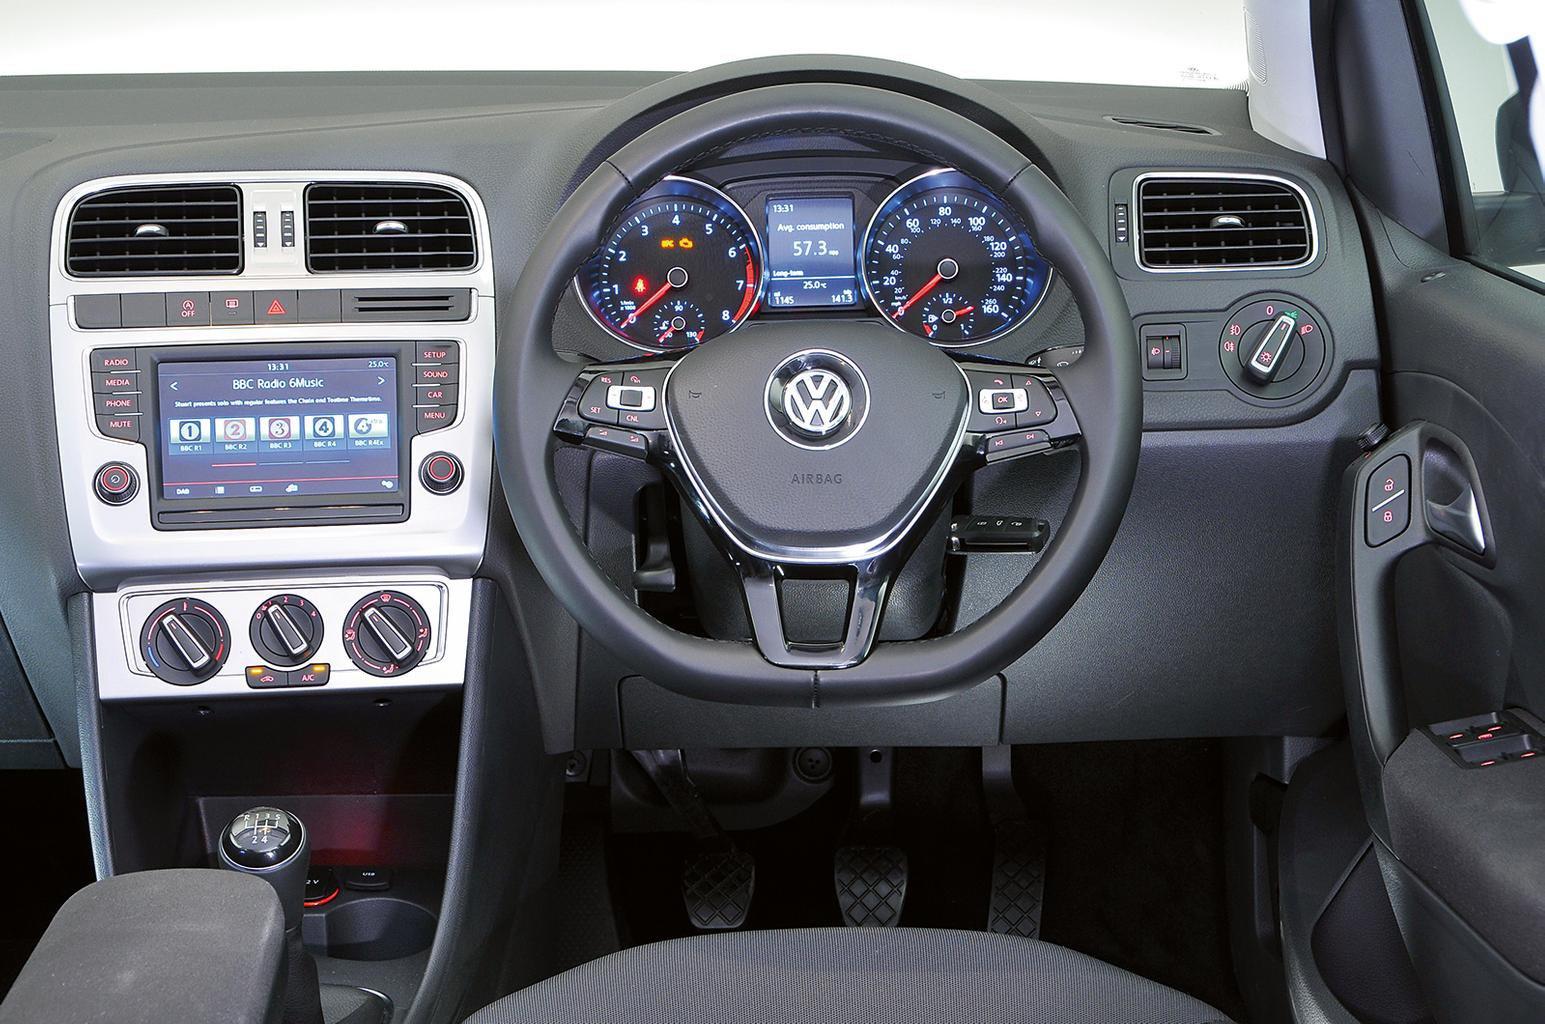 Used test: Audi A1 vs Mini hatch vs Volkswagen Polo